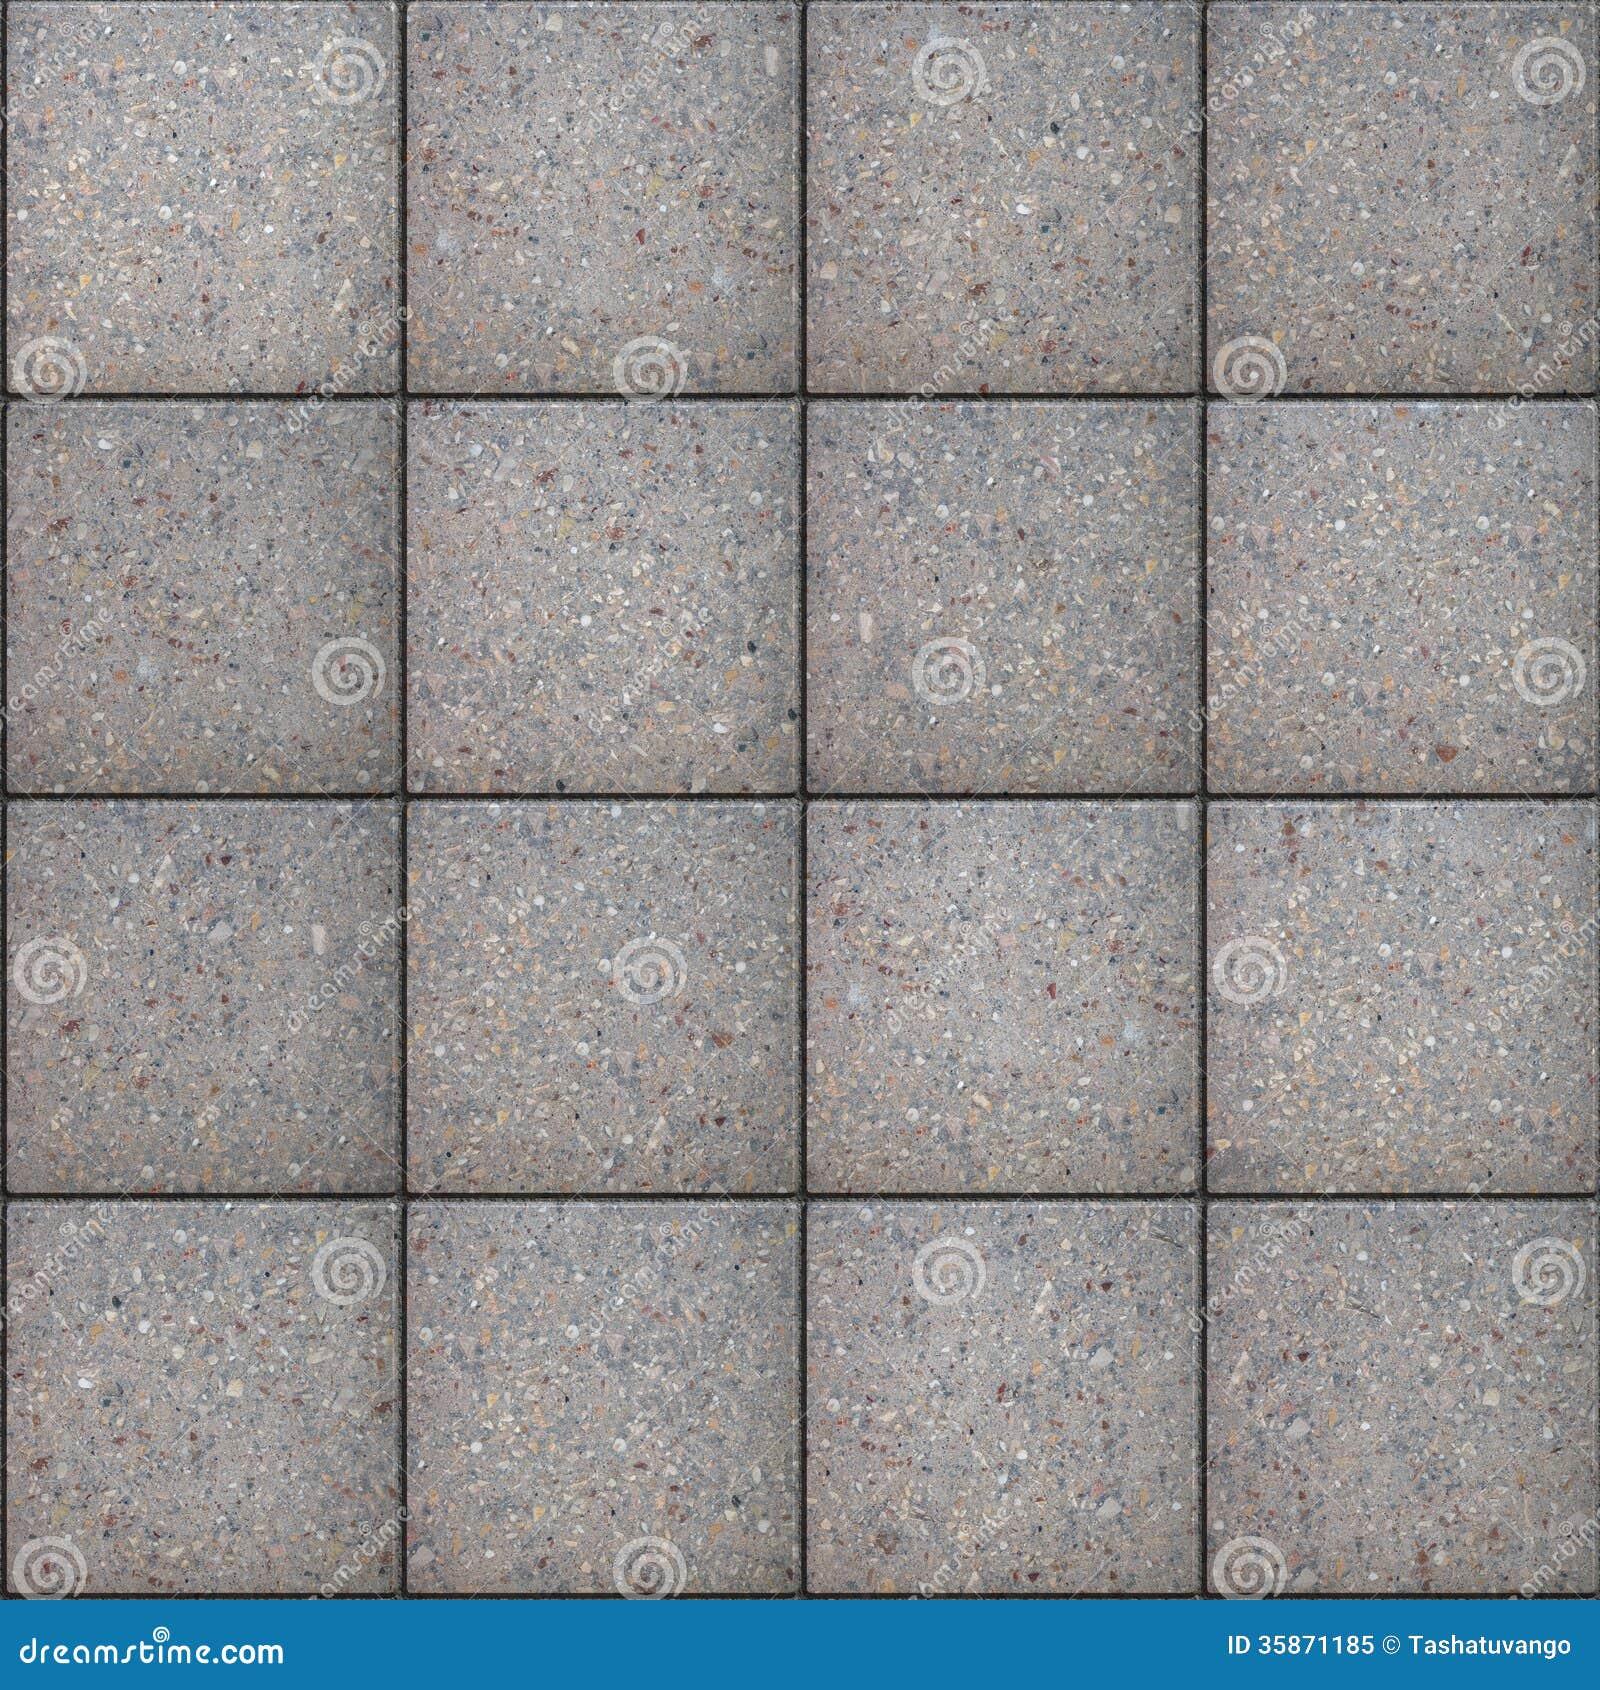 Texture Concrete Slab : Paving slabs seamless tileable texture stock image